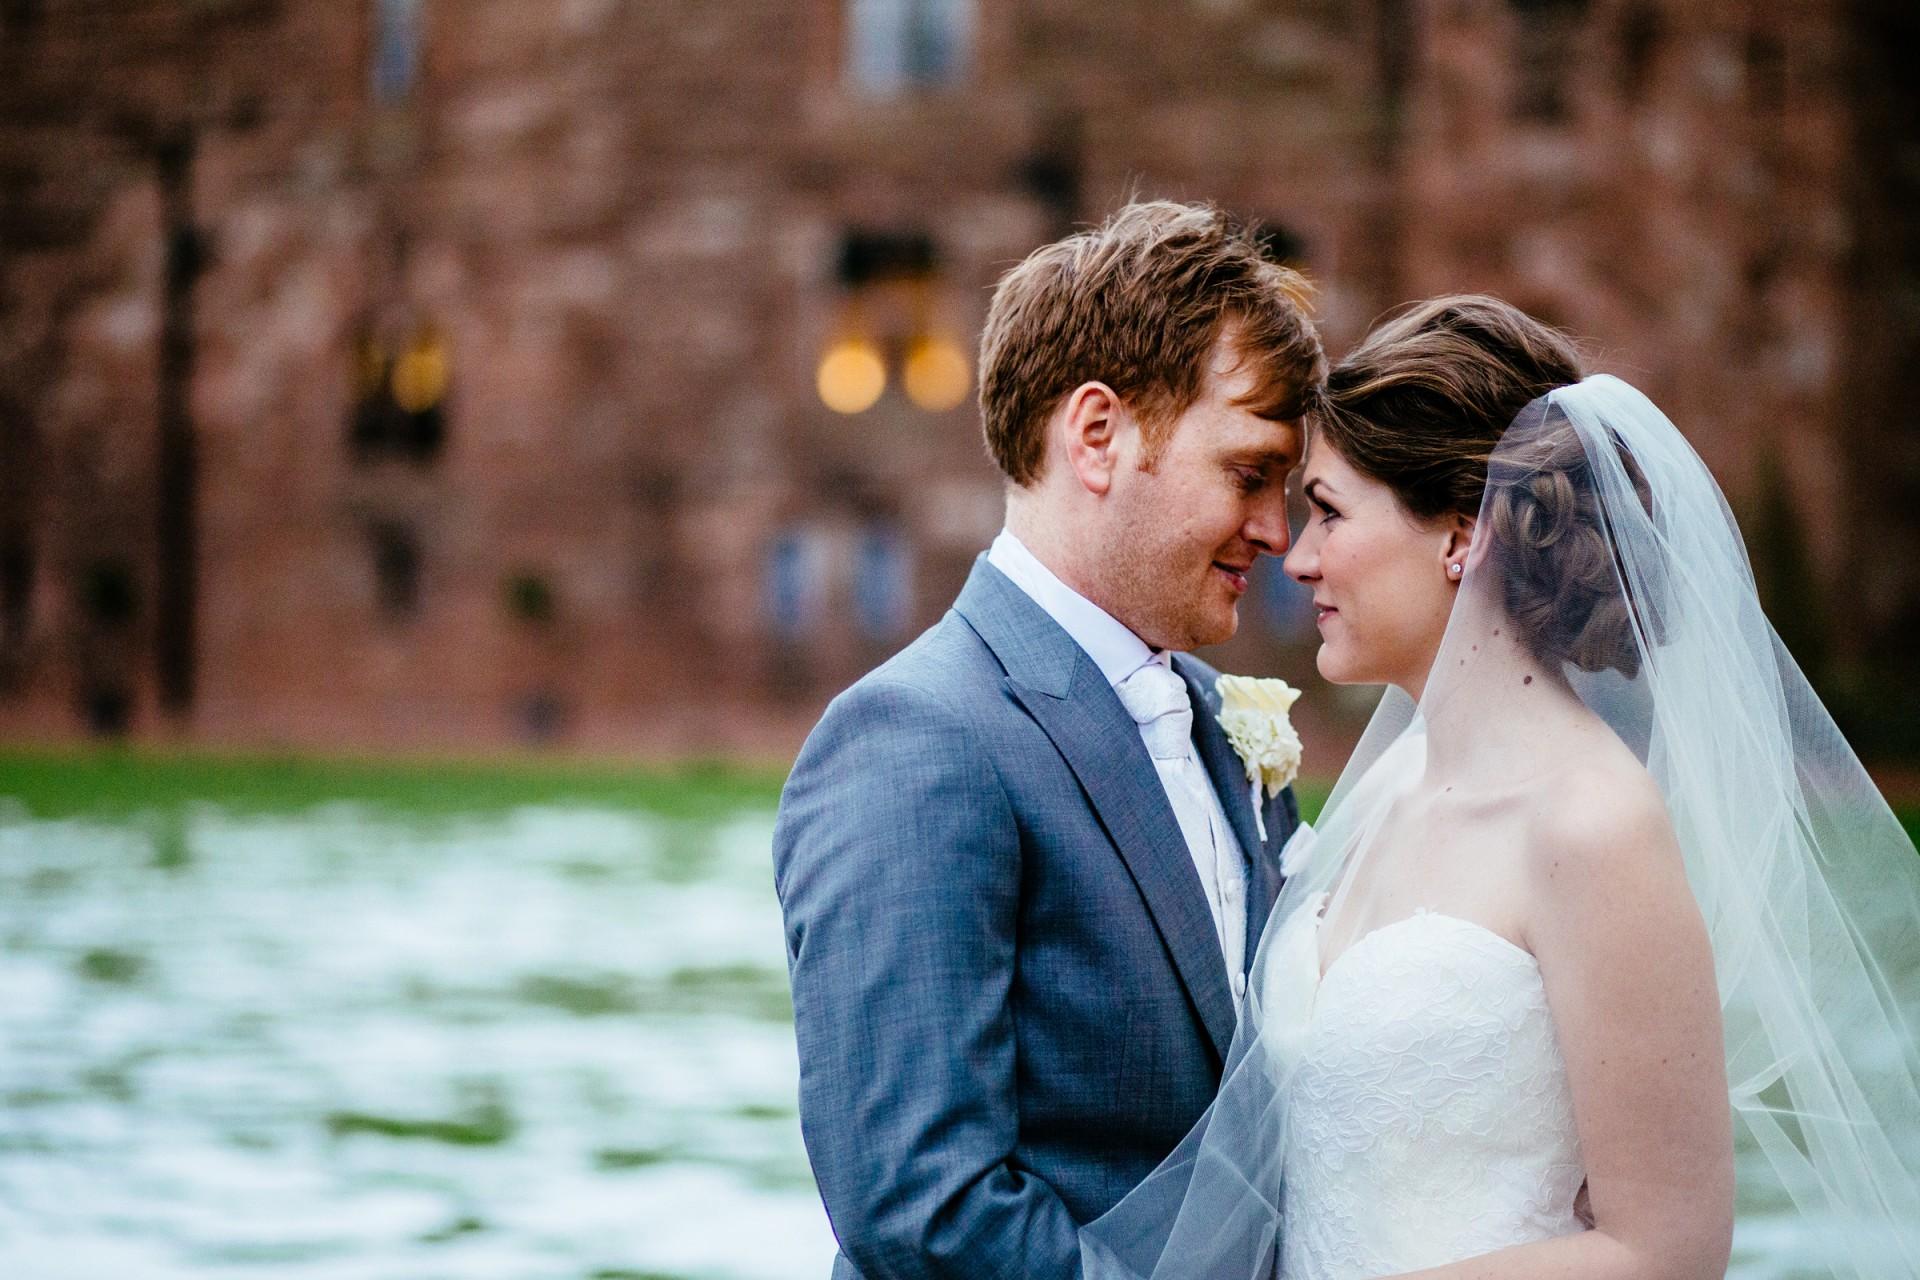 Katie-Joe_Sansom-Photography_New-Years-Eve-Wedding_026